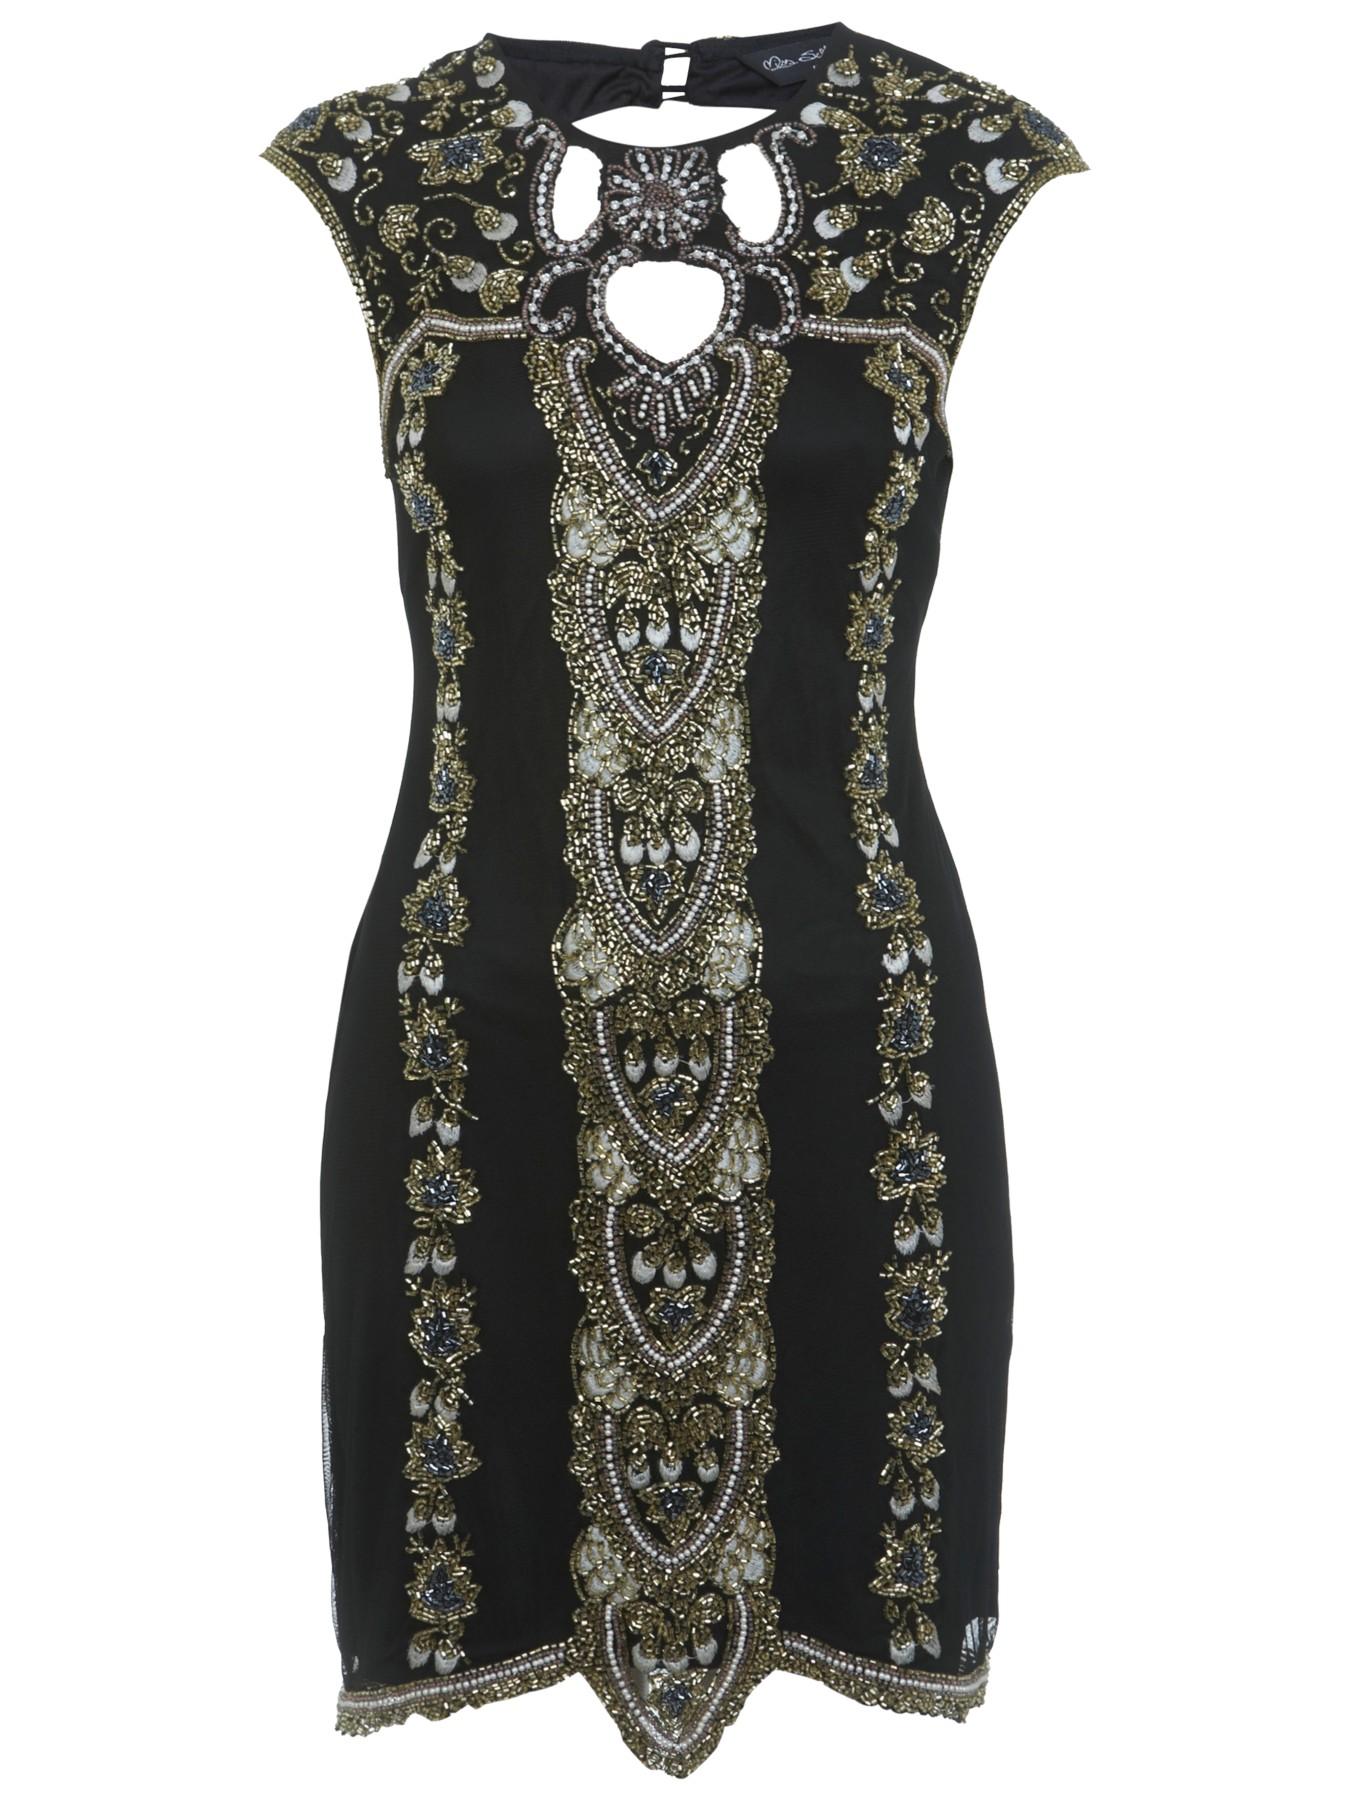 Miss selfridge black gold dress